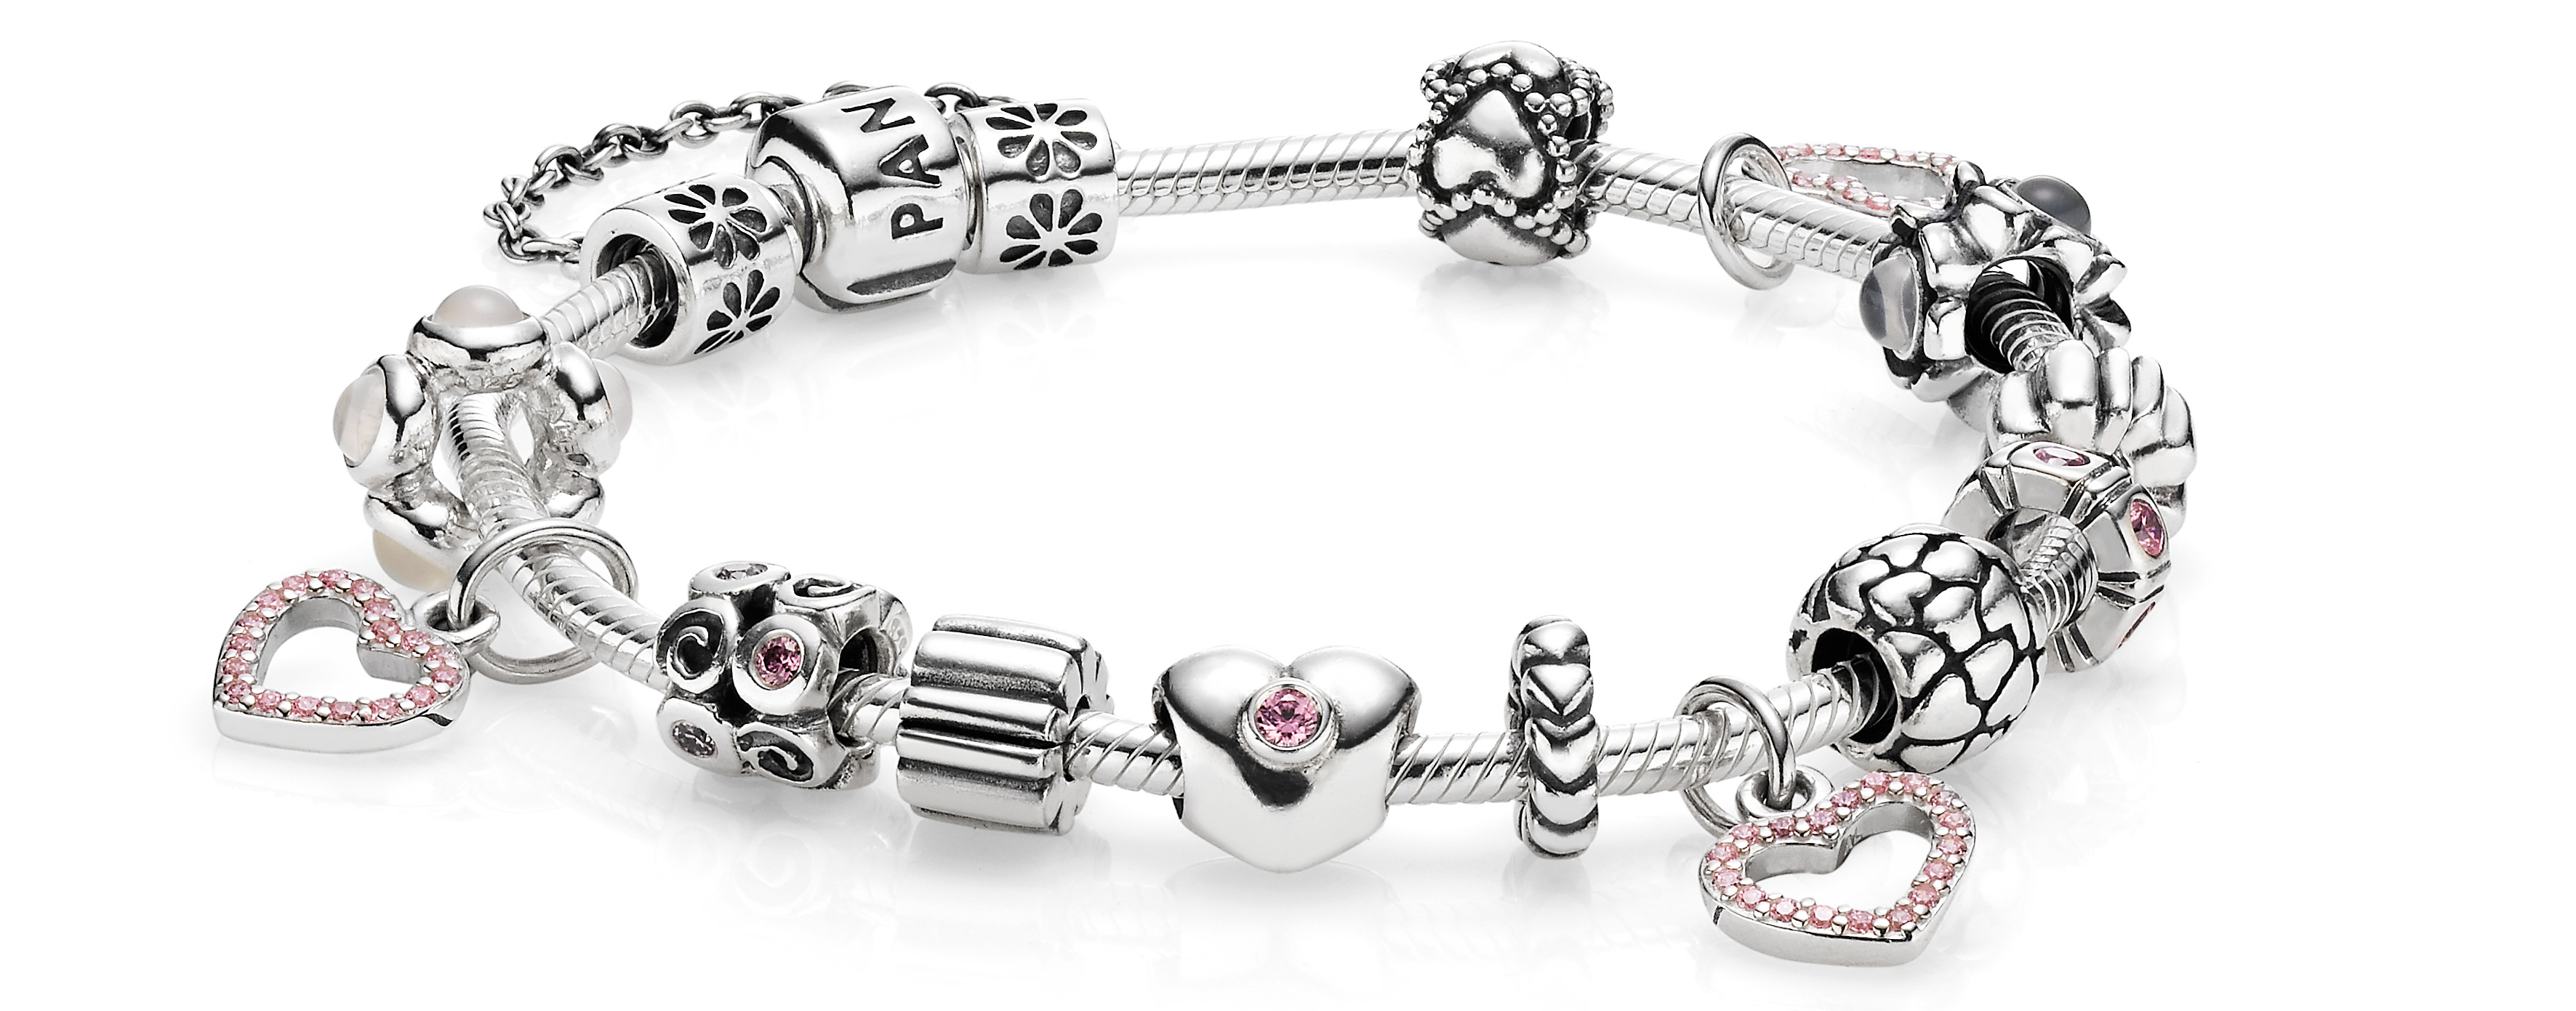 Pandora Bracelet Examples